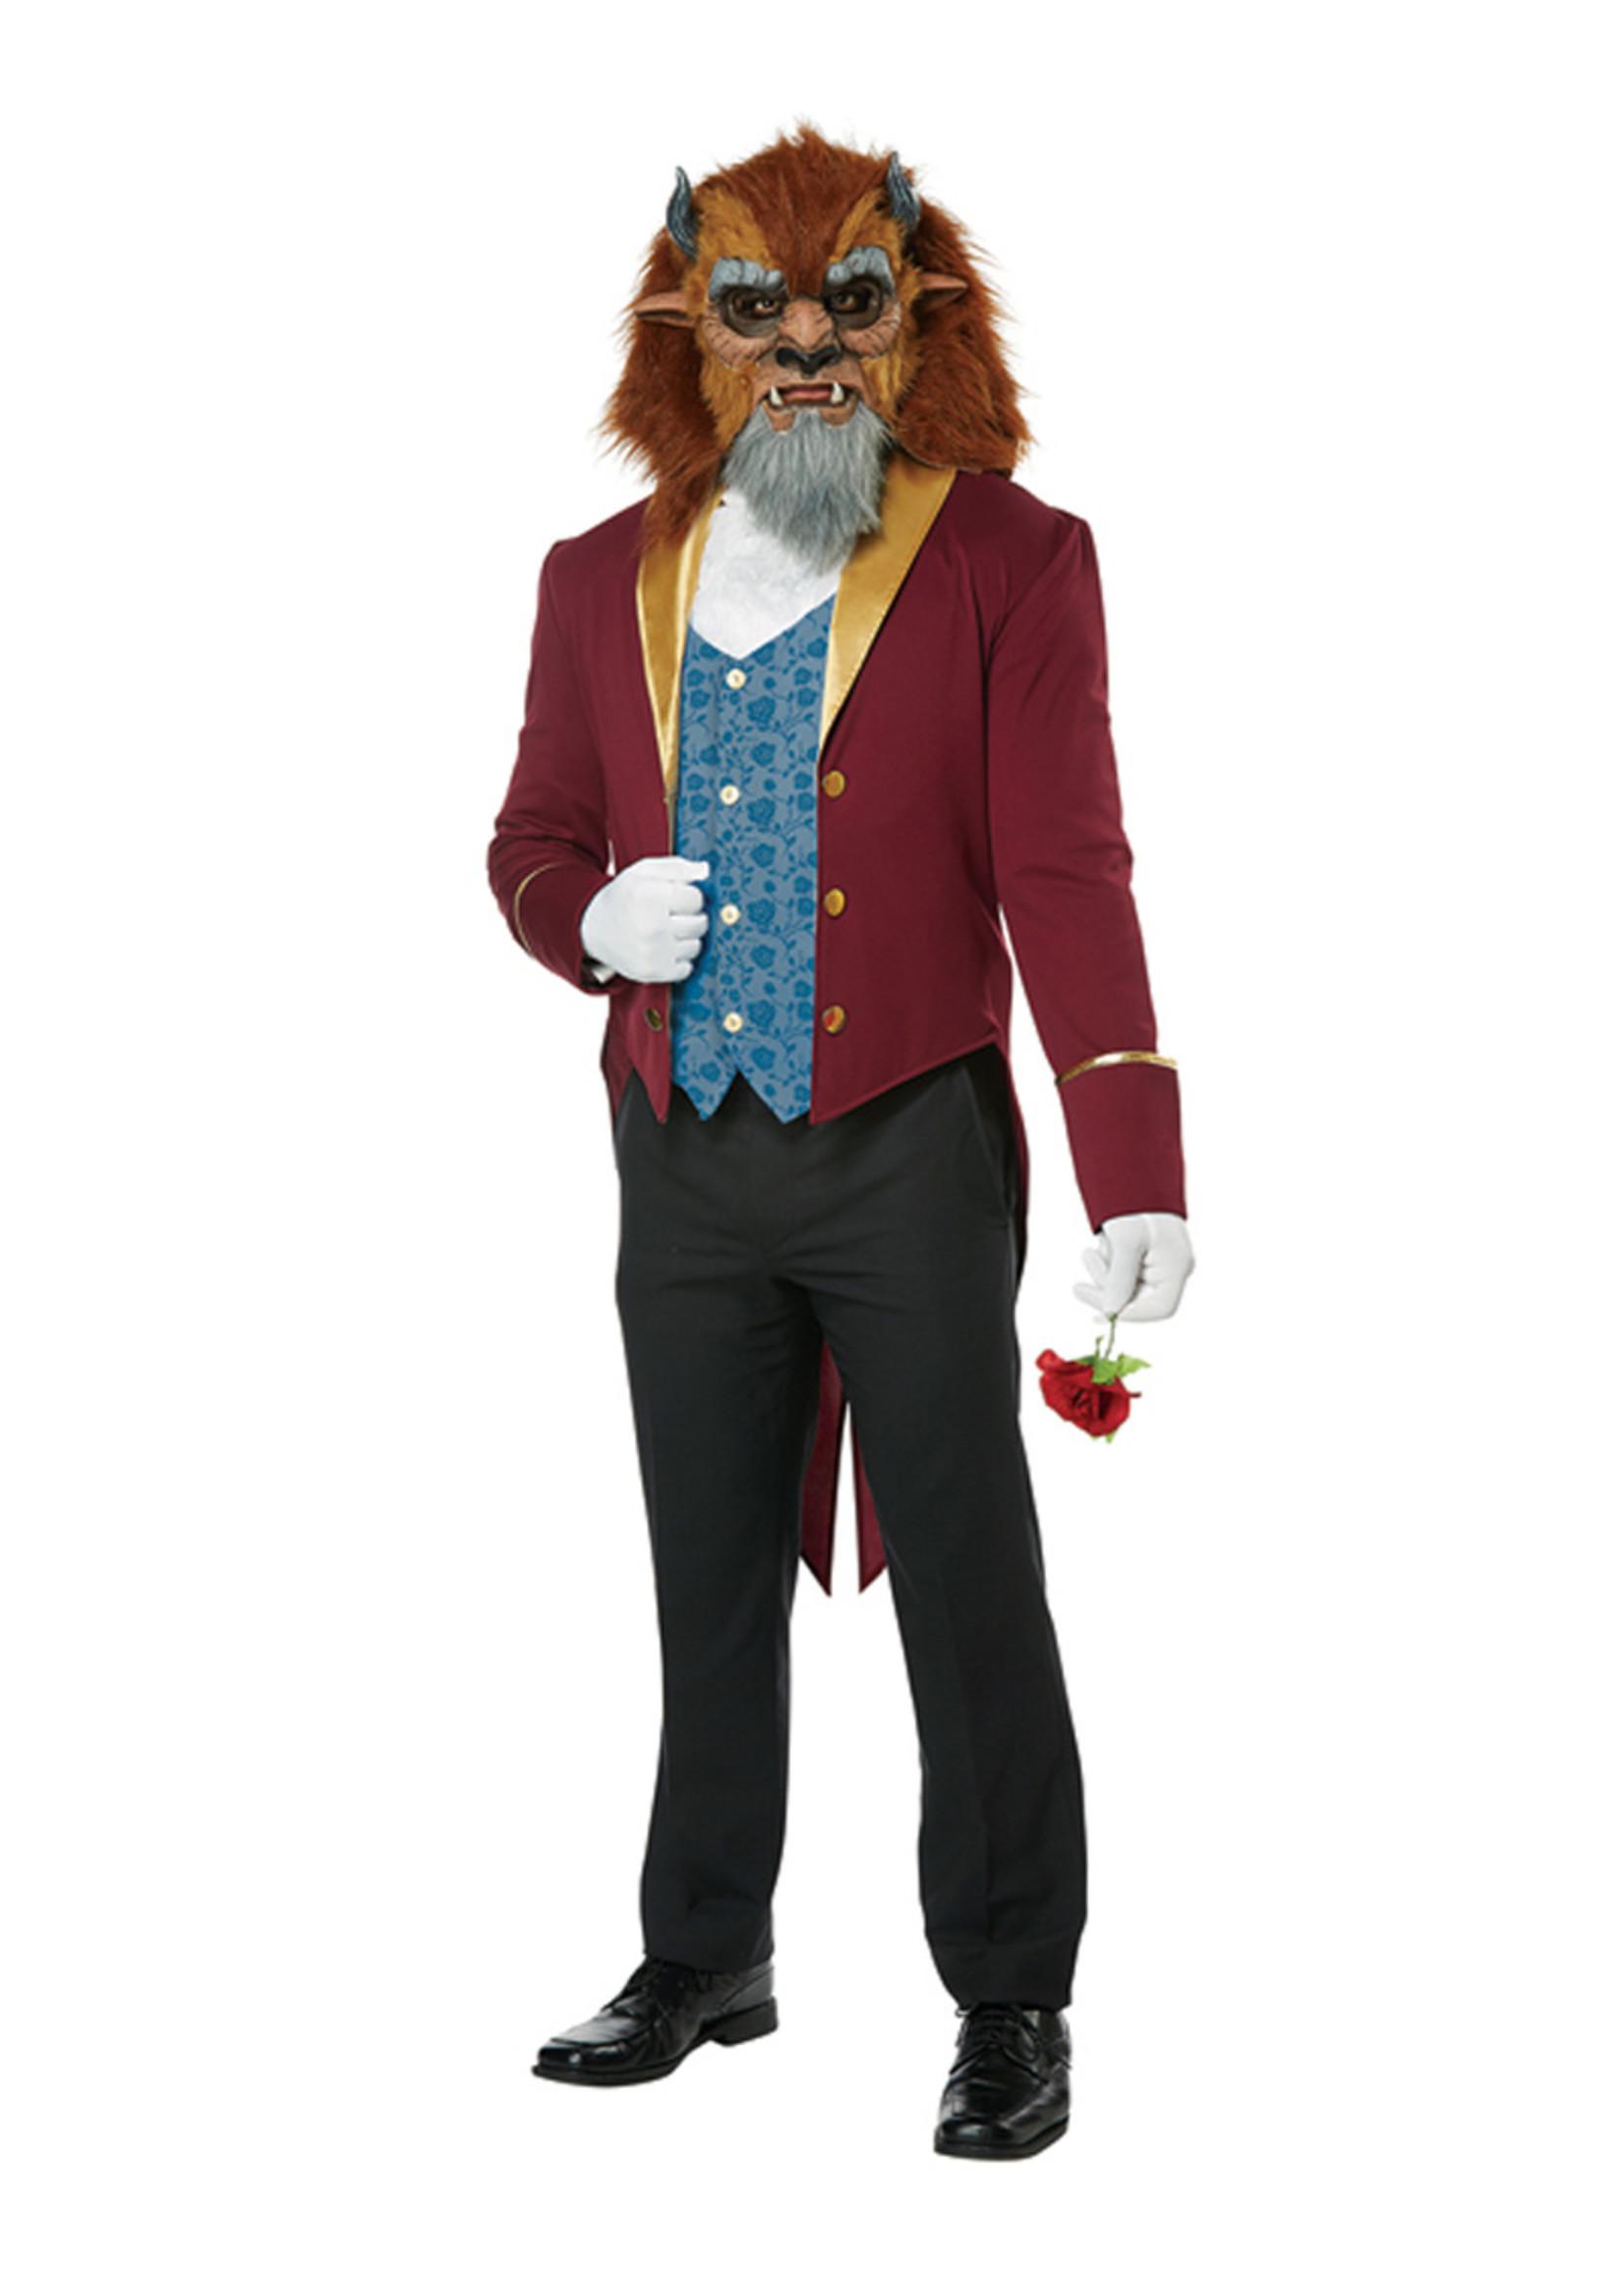 Storybook Beast Costume - Men's